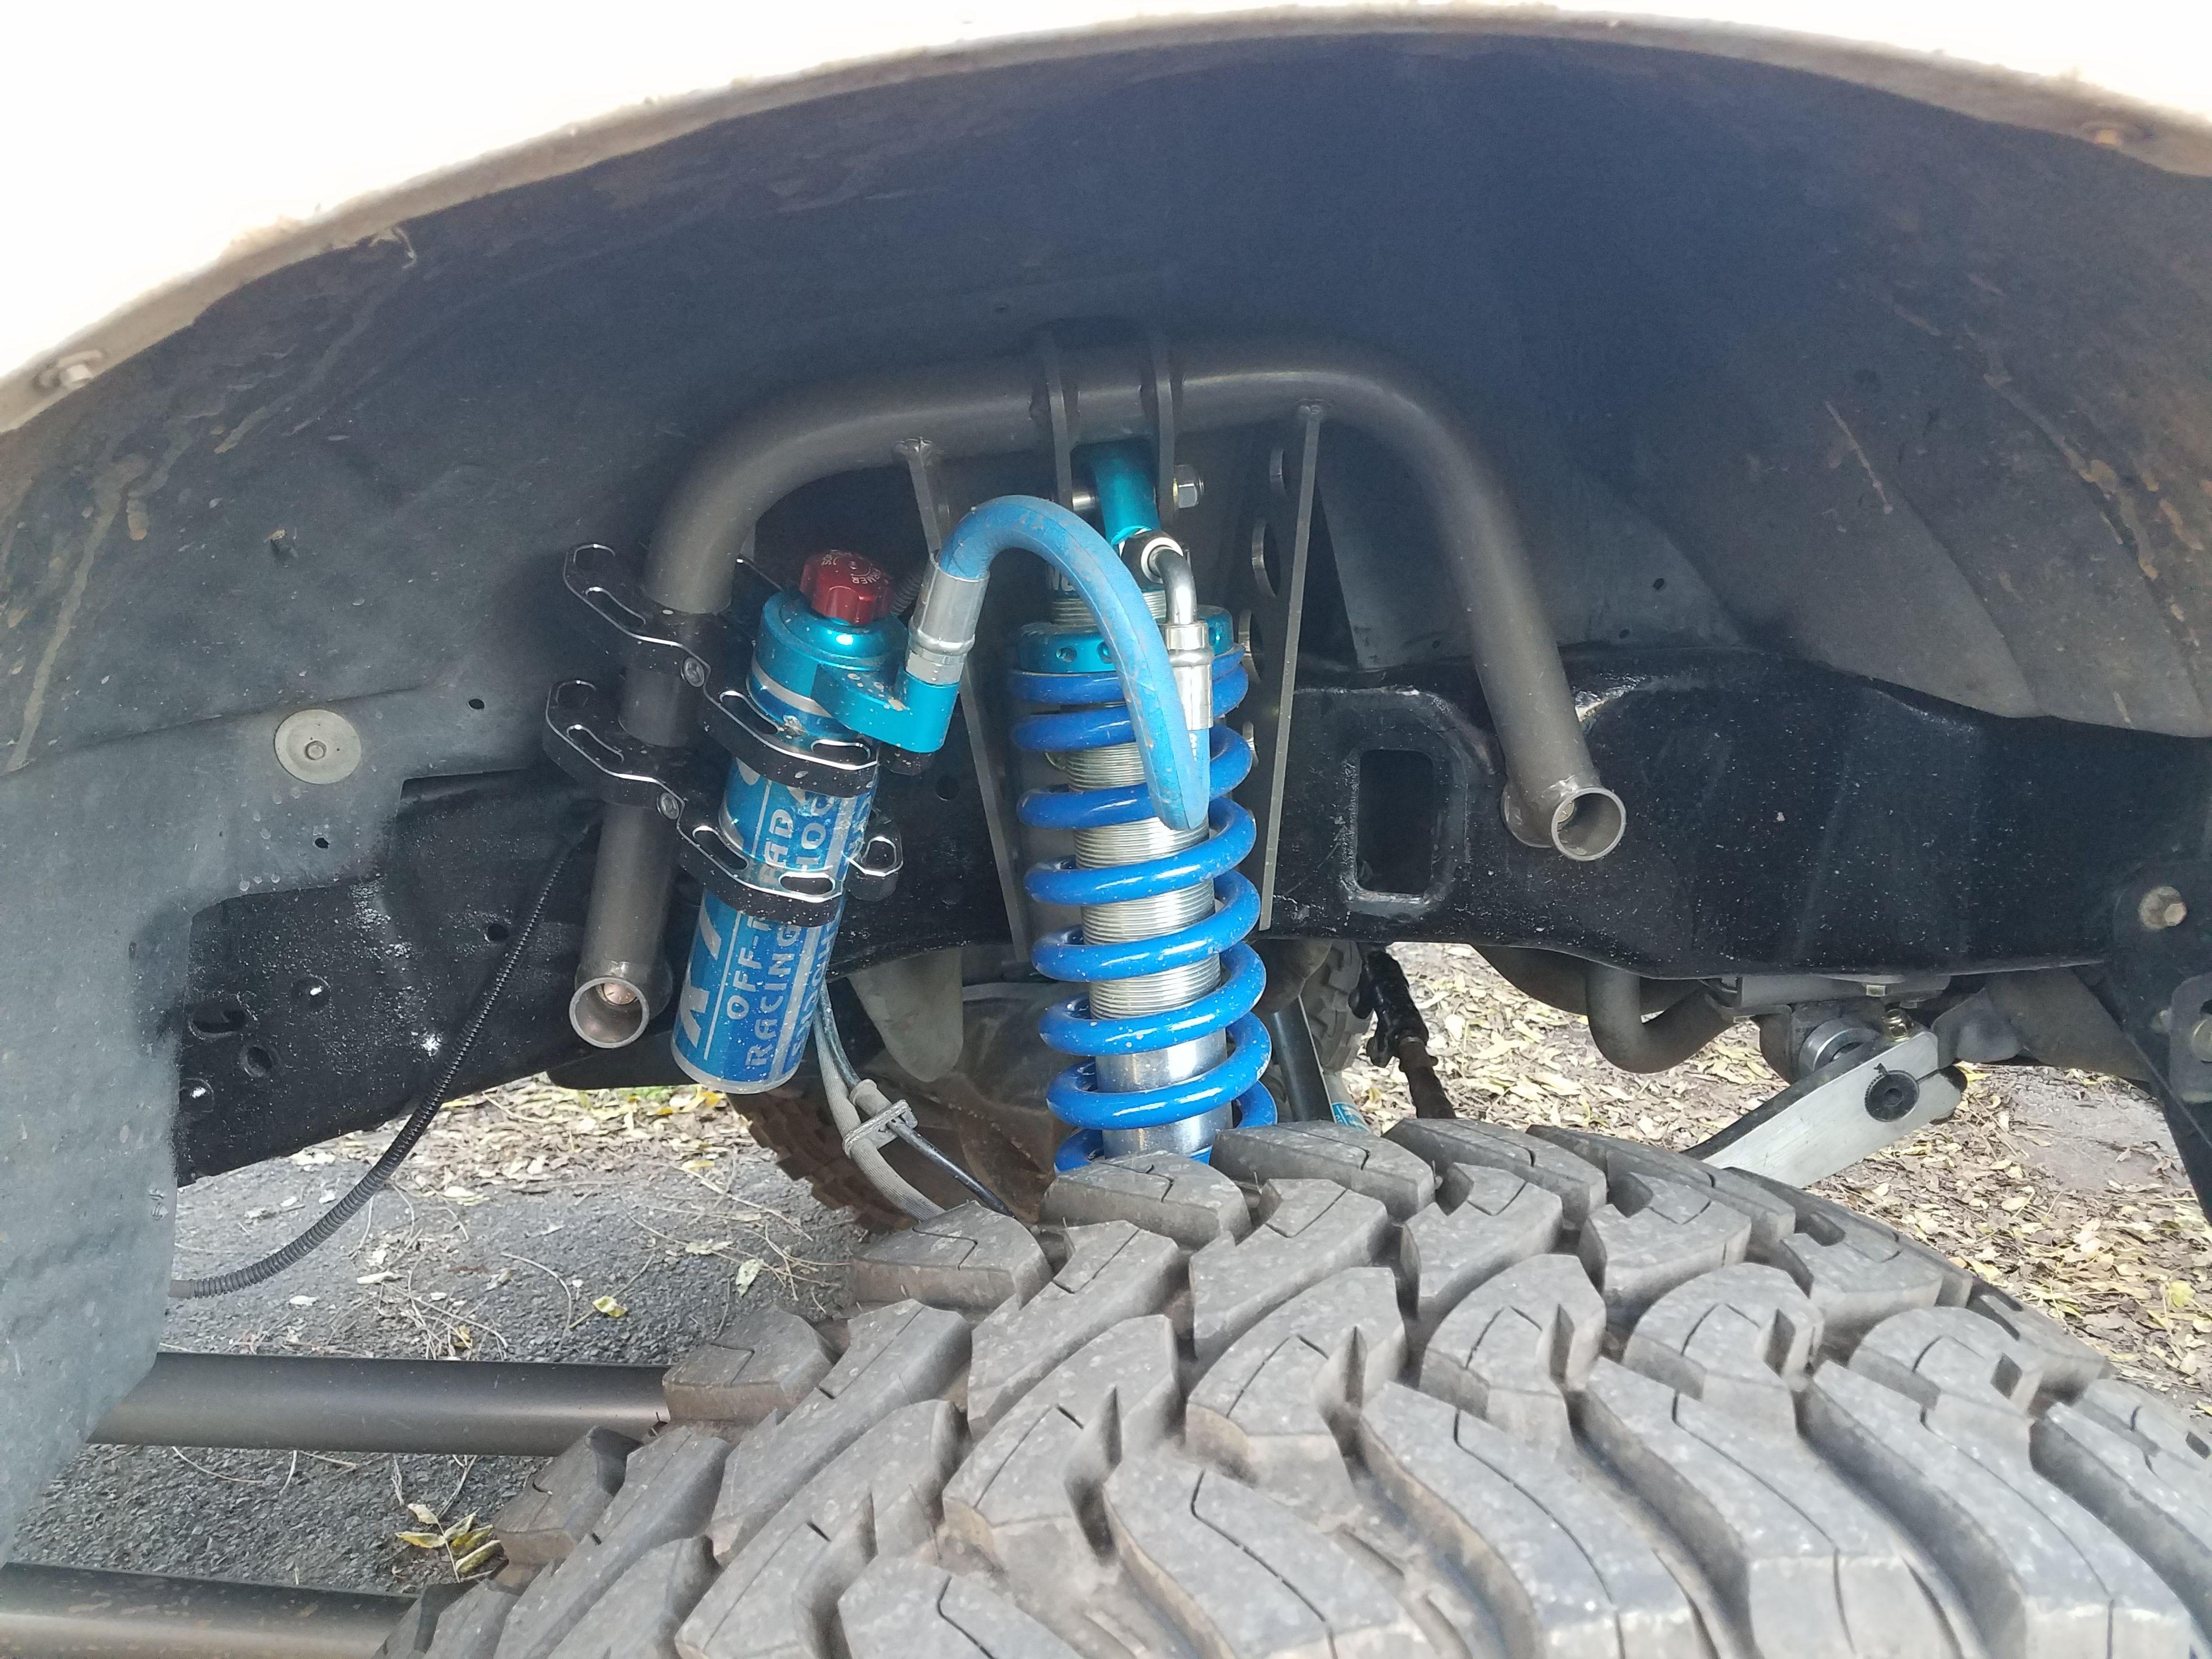 1999 2000 2001 2002 2003 F250 F350 7 3l 6 0 Diesel Excursion Super Duty Leaf Spring Delete 4 Link King Coil Over Conversion F Powerstroke F250 Built Ford Tough